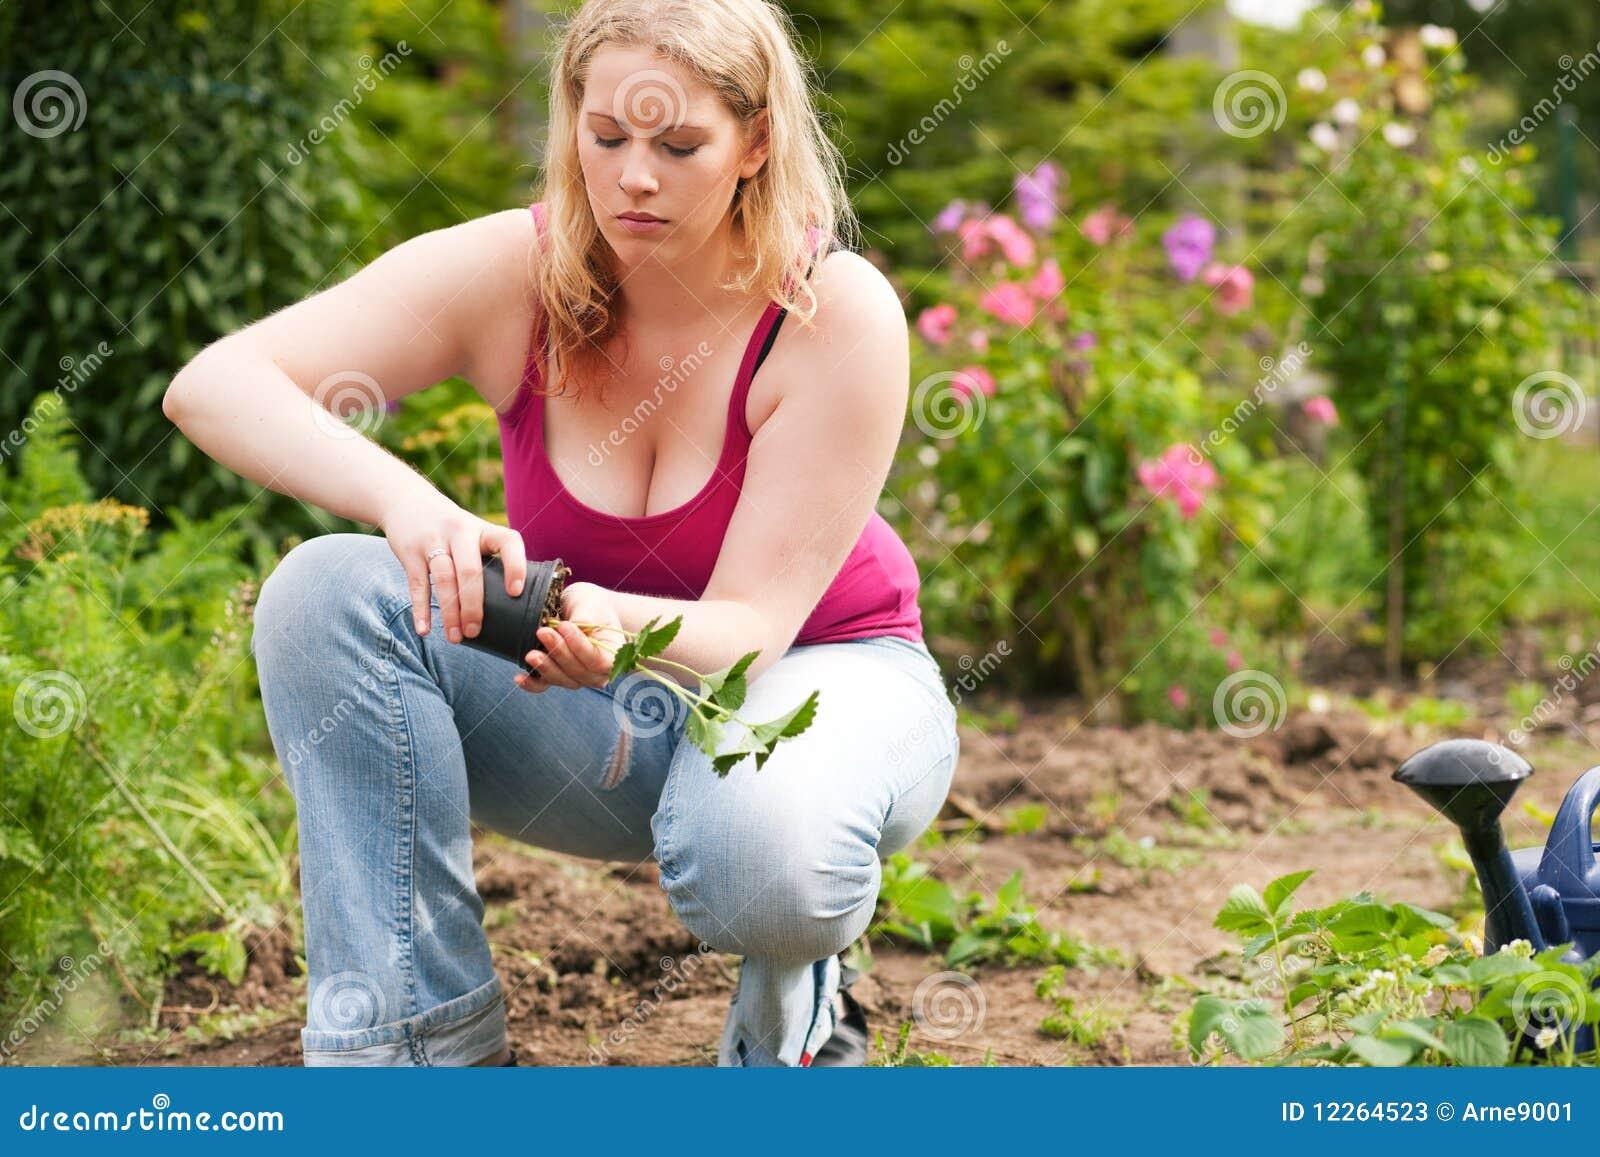 woman planting strawberries her garden 12264523